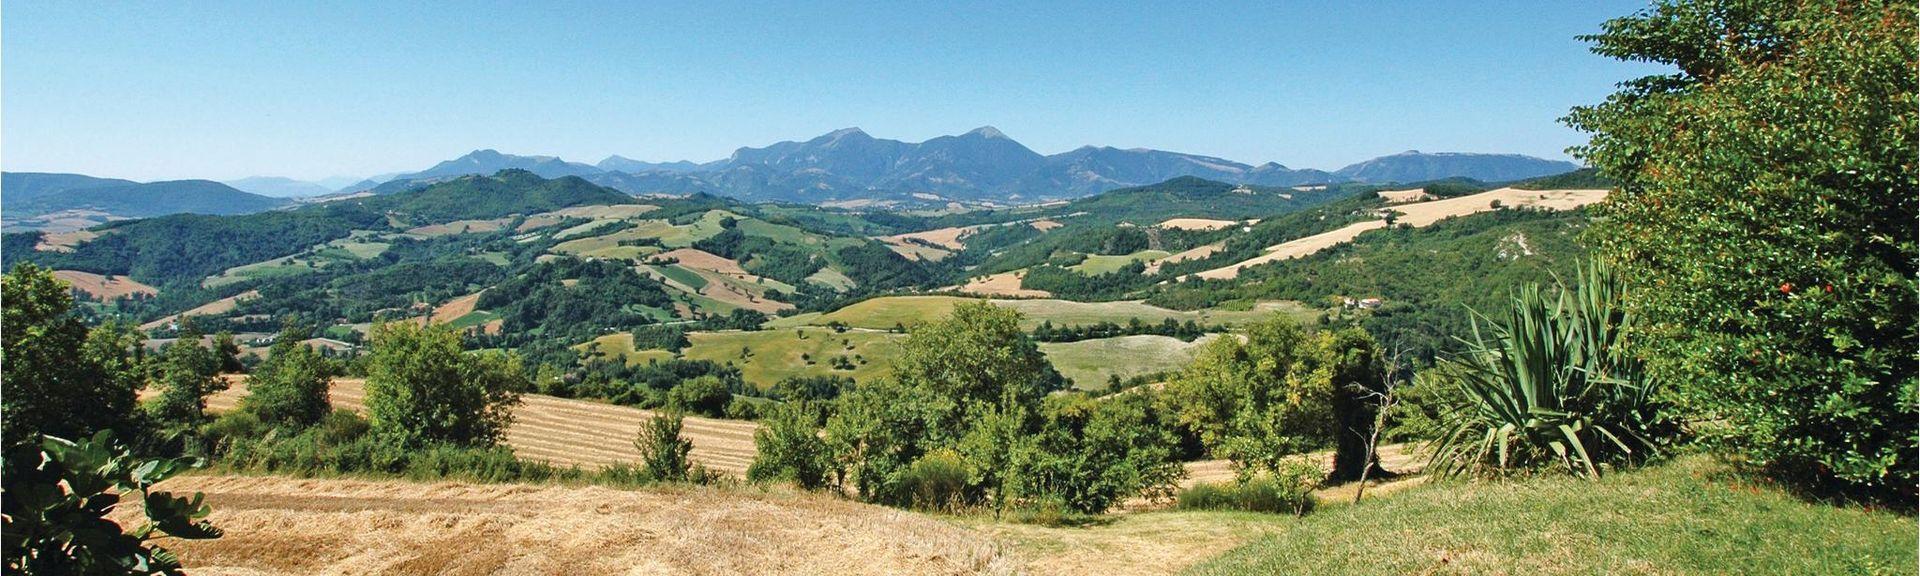 Mondavio, Pesaro and Urbino, Marche, Italy